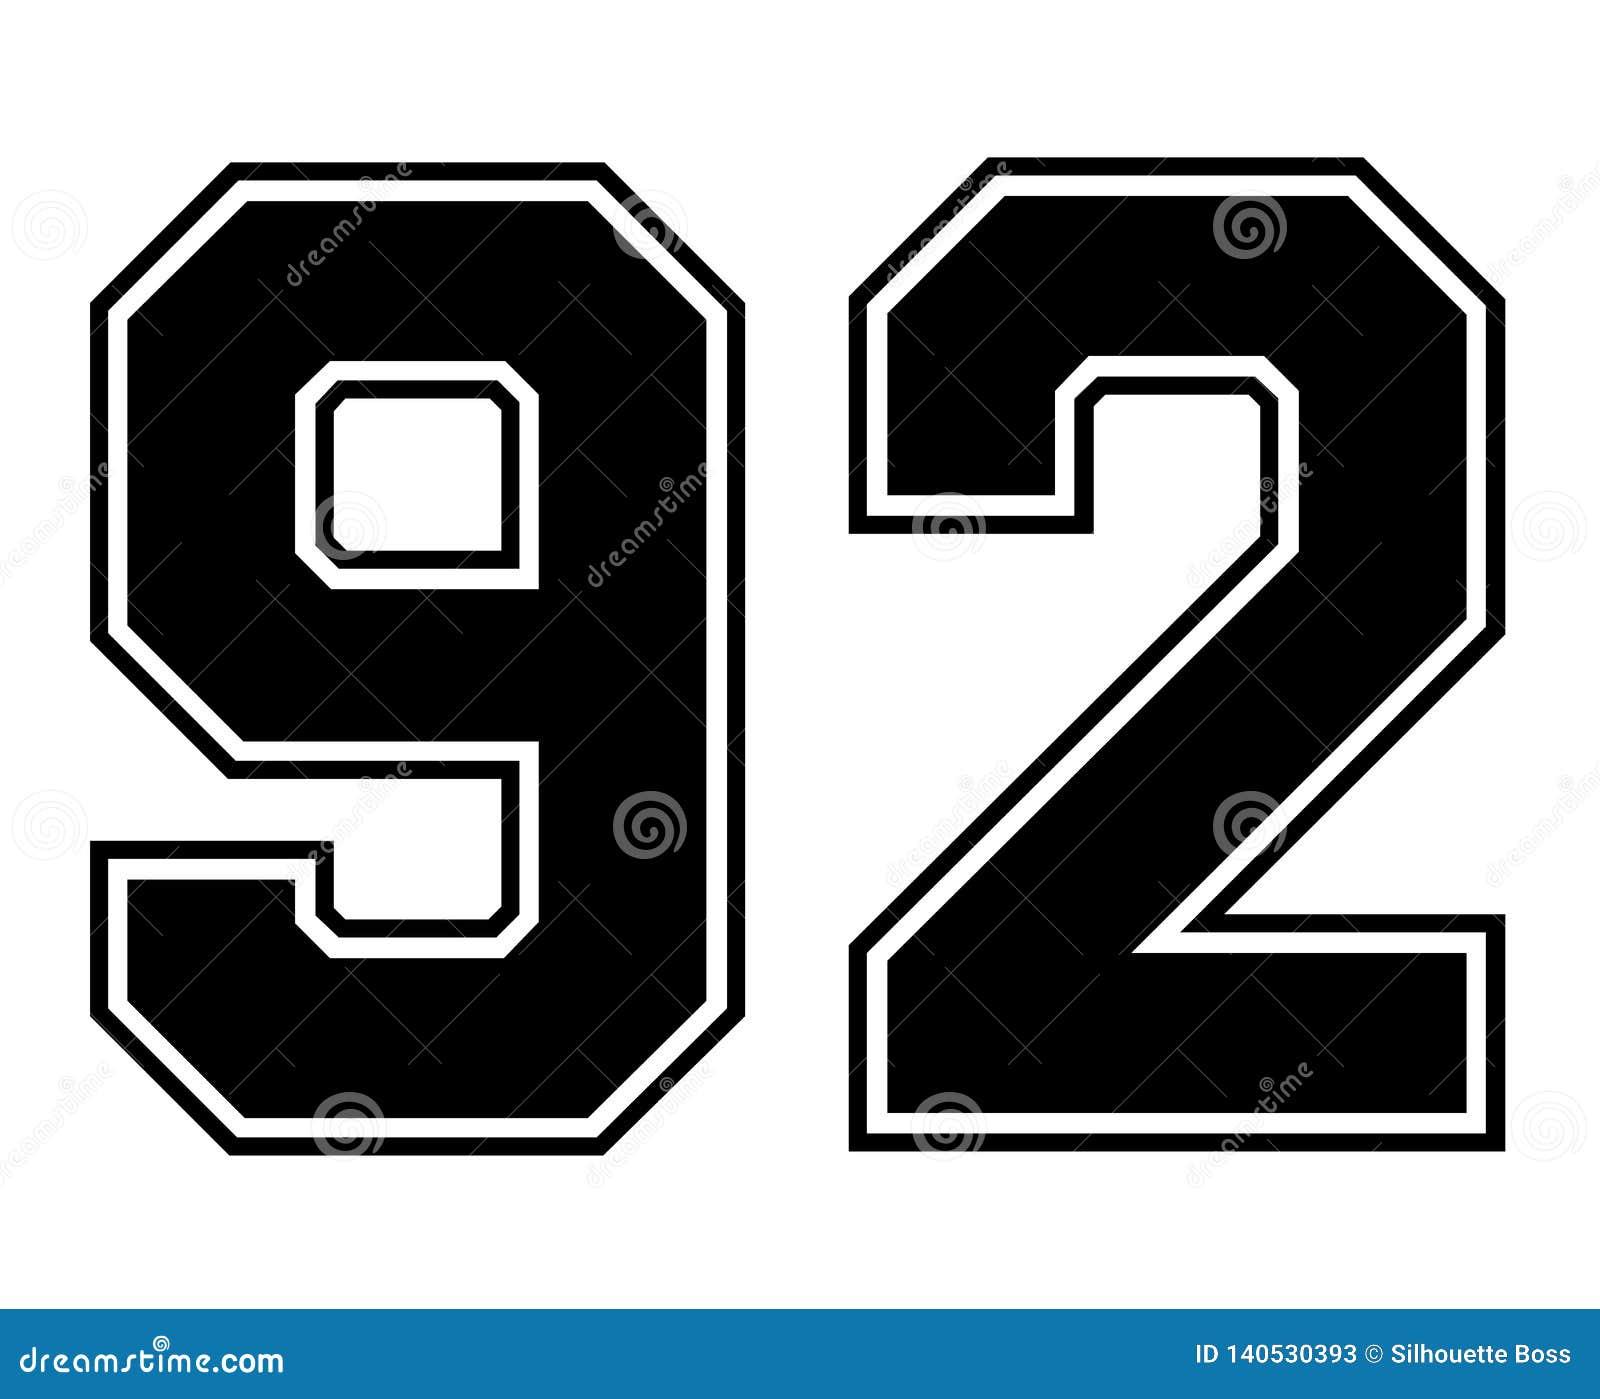 92 Classic Vintage Sport Jersey Number In Black Number On